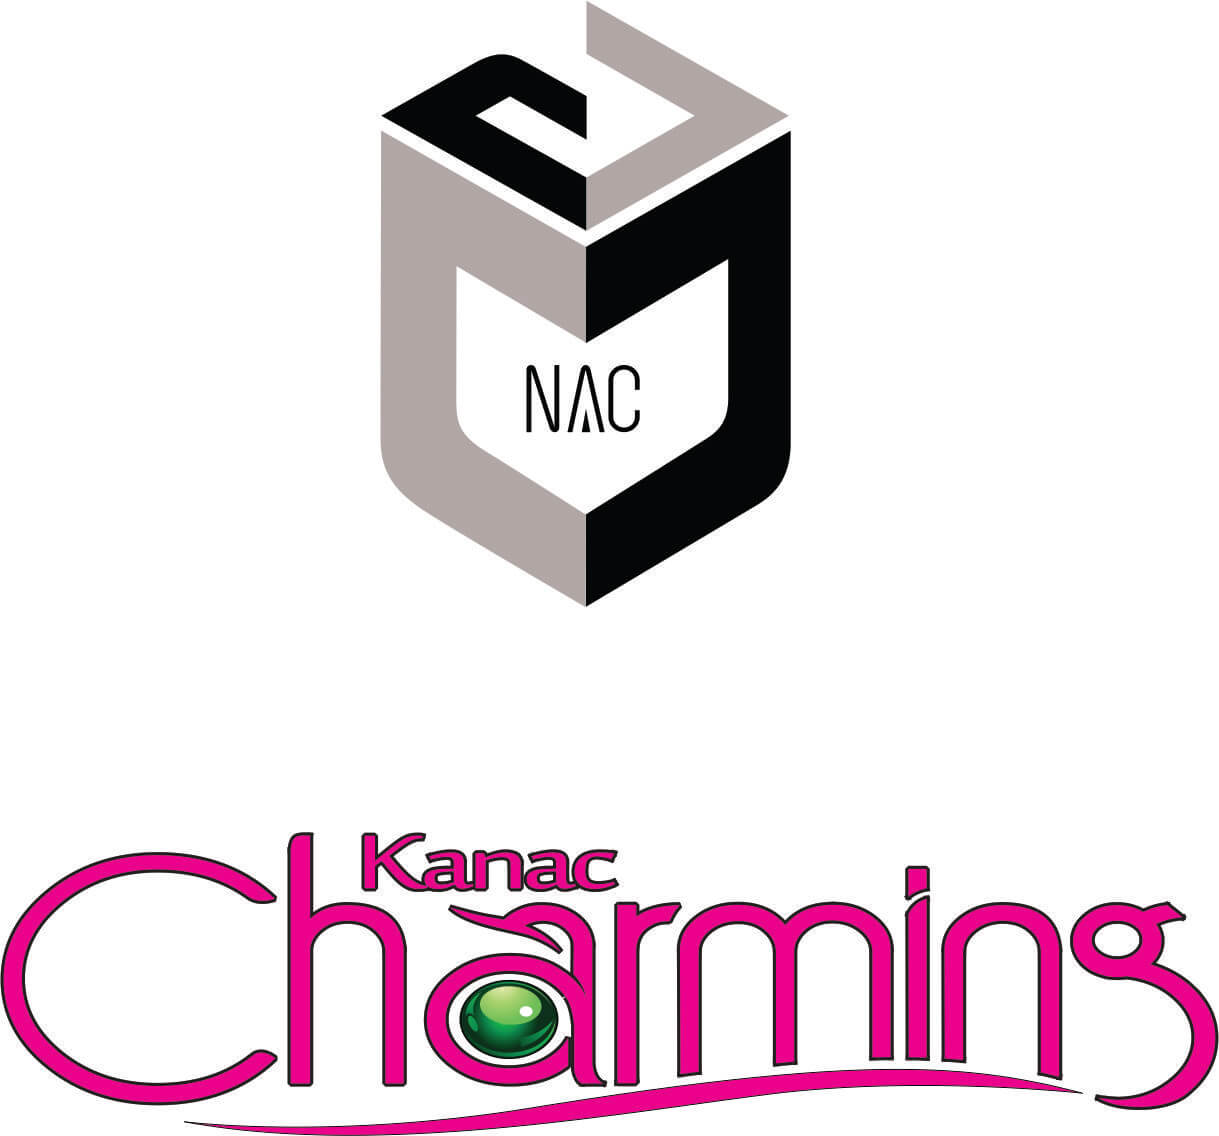 Kanac Charming